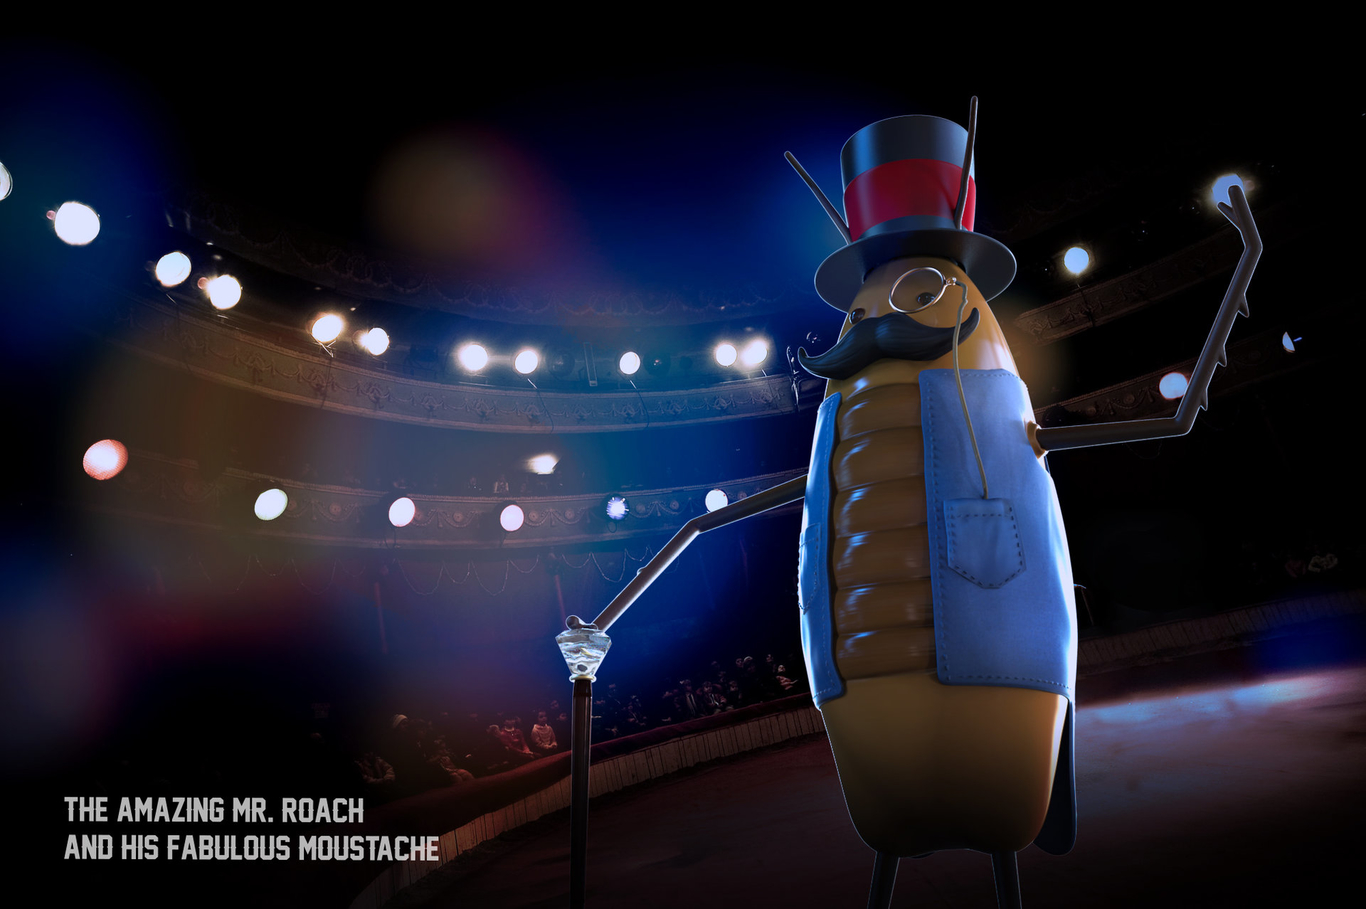 Susskind the amazing mr roach 1 6f0031f3 fbgv